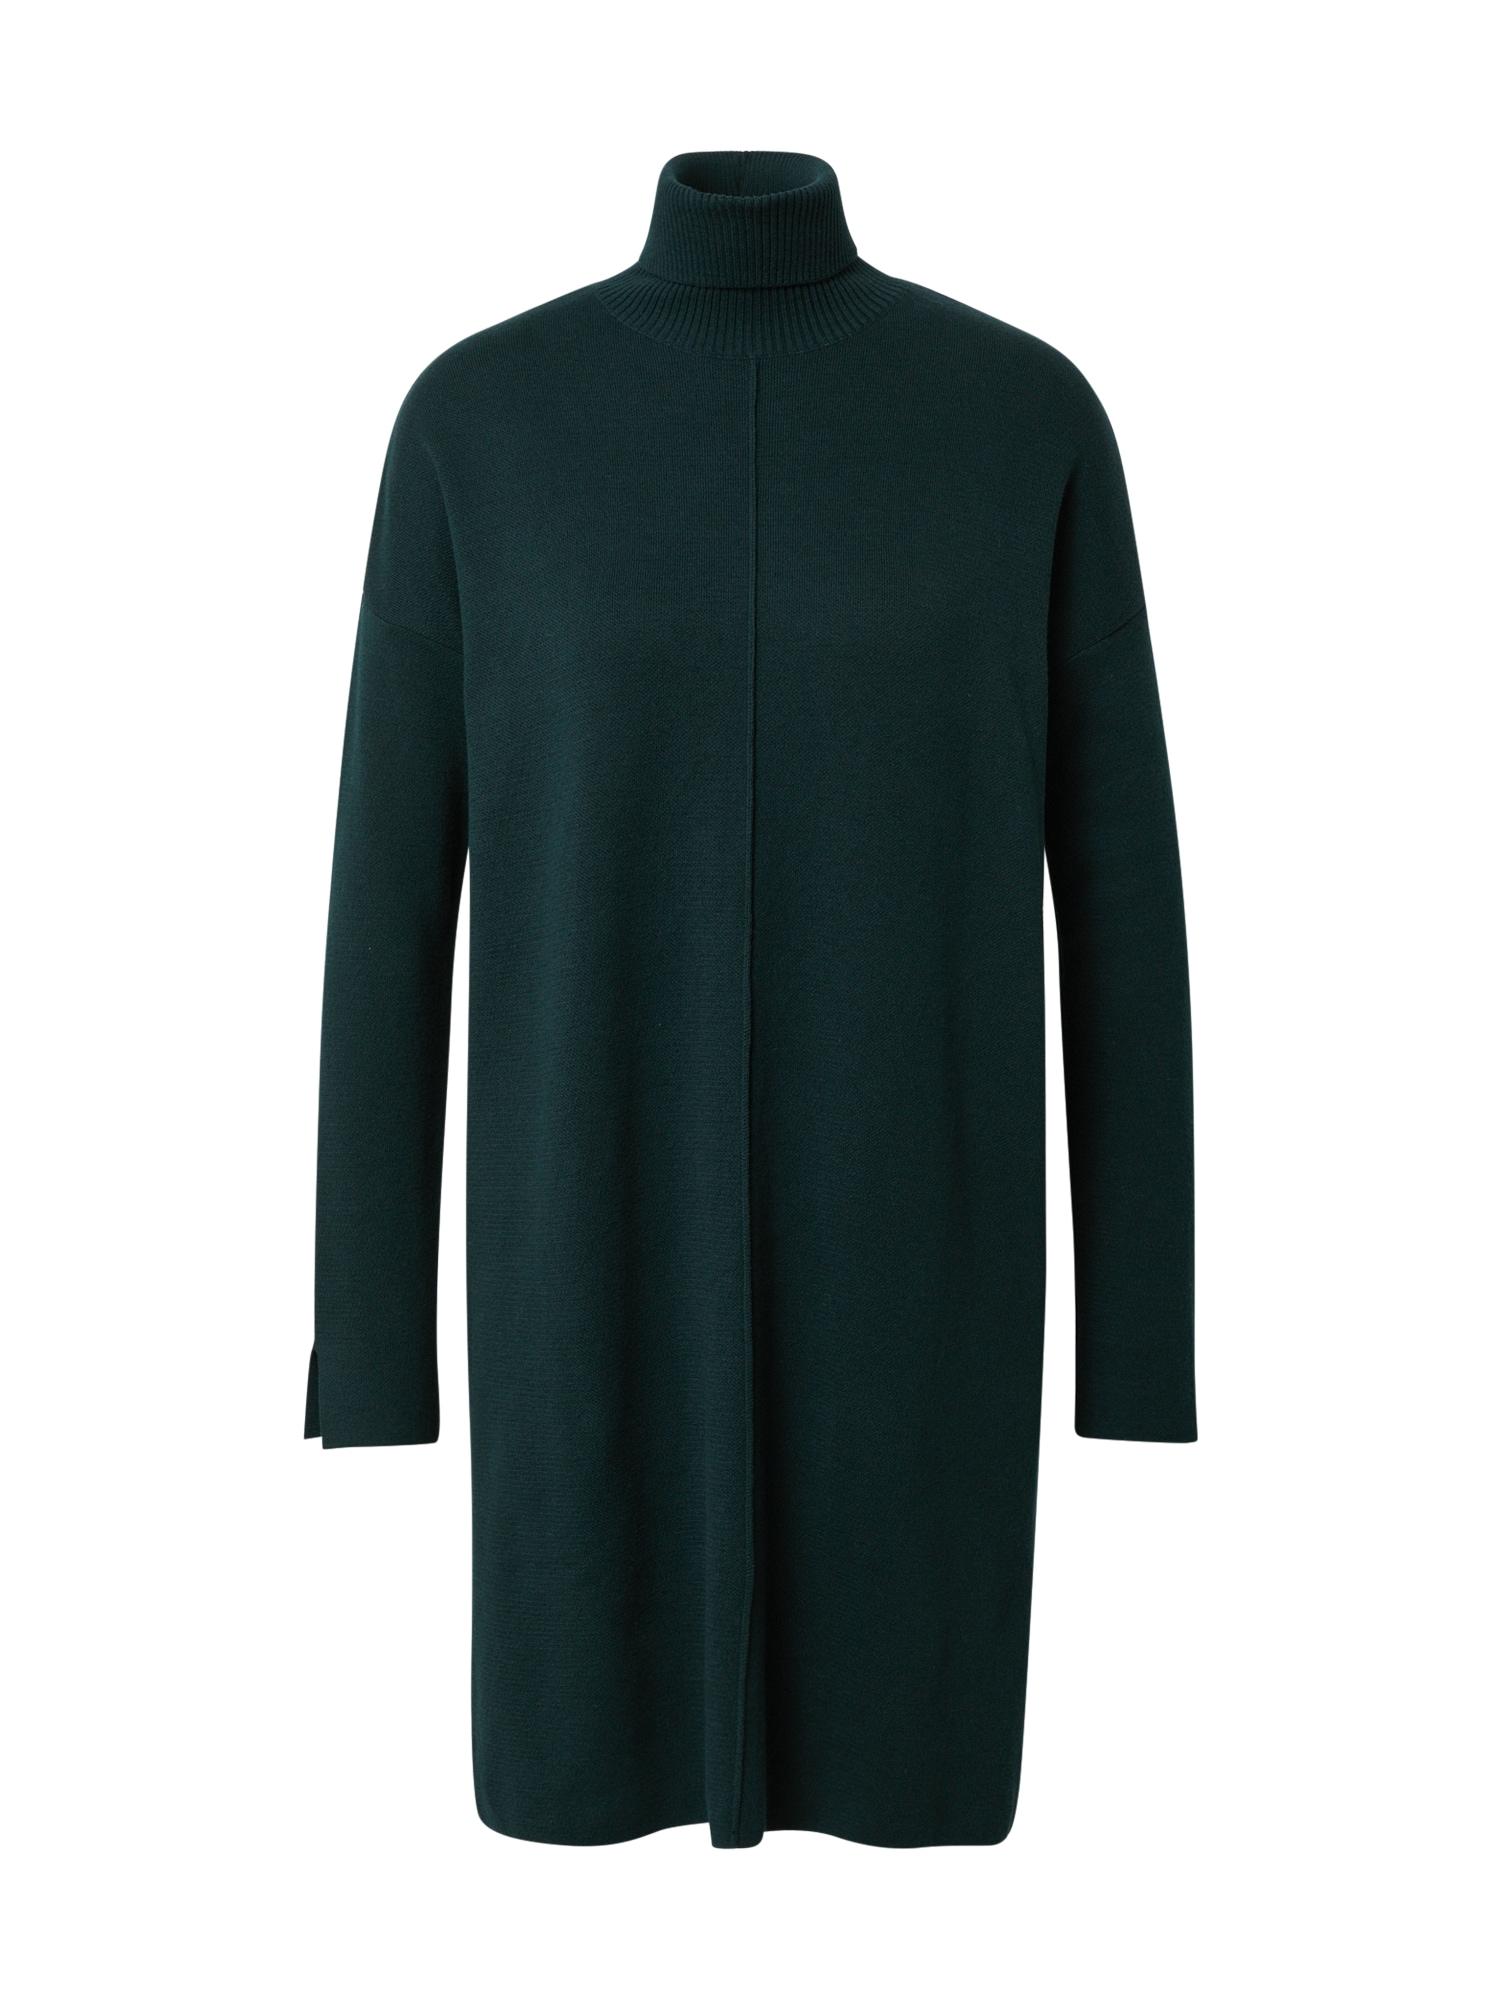 ARMEDANGELS Megzta suknelė tamsiai žalia